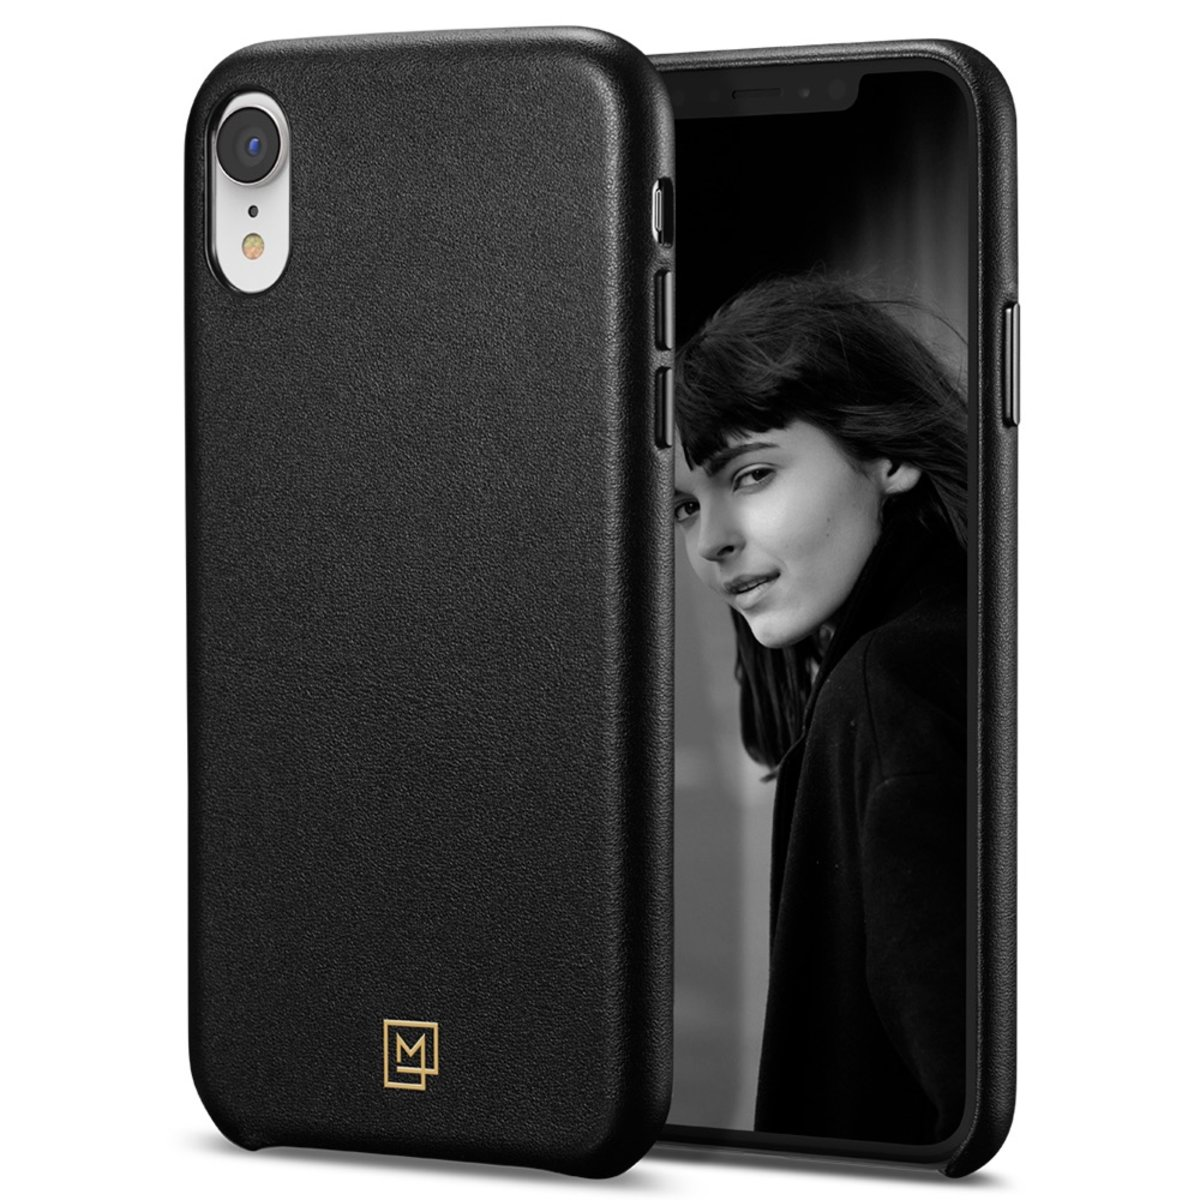 iPhone XR Case La Manon câlin - Chic Black